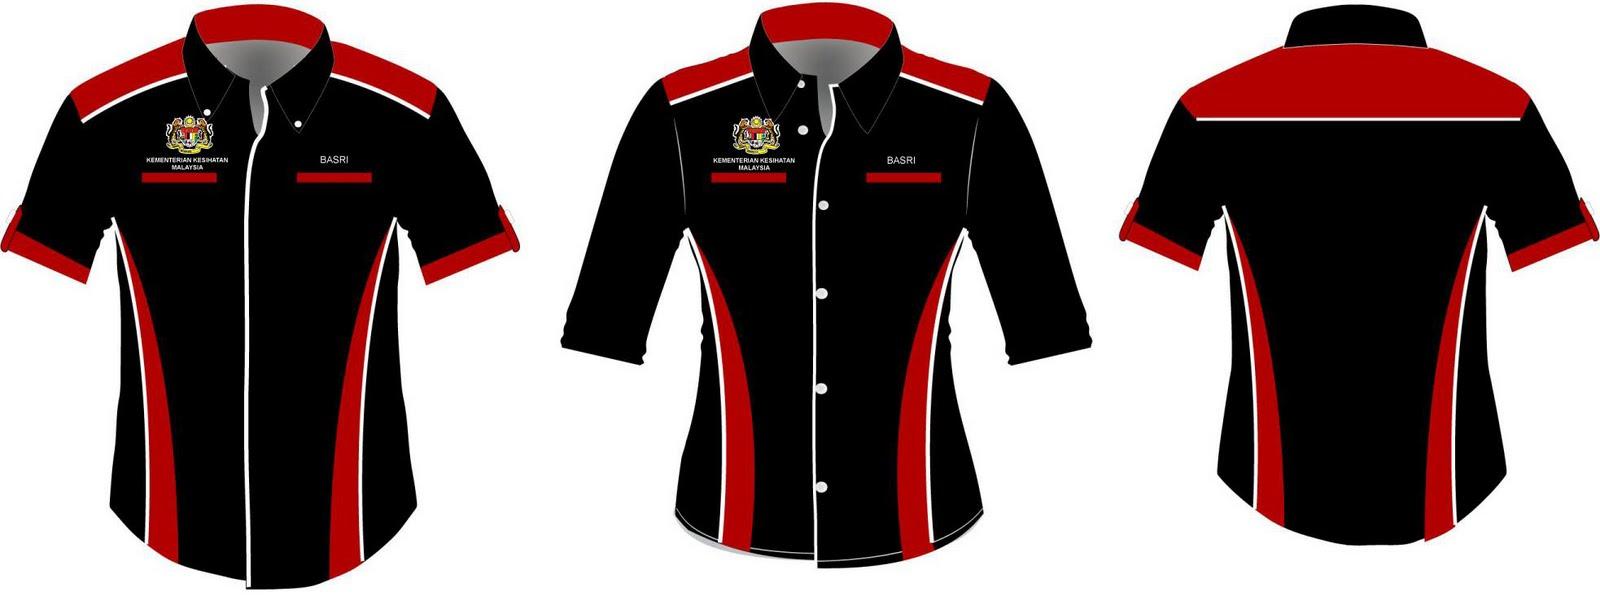 Design F1 Shirt HKL | Corporate Shirts